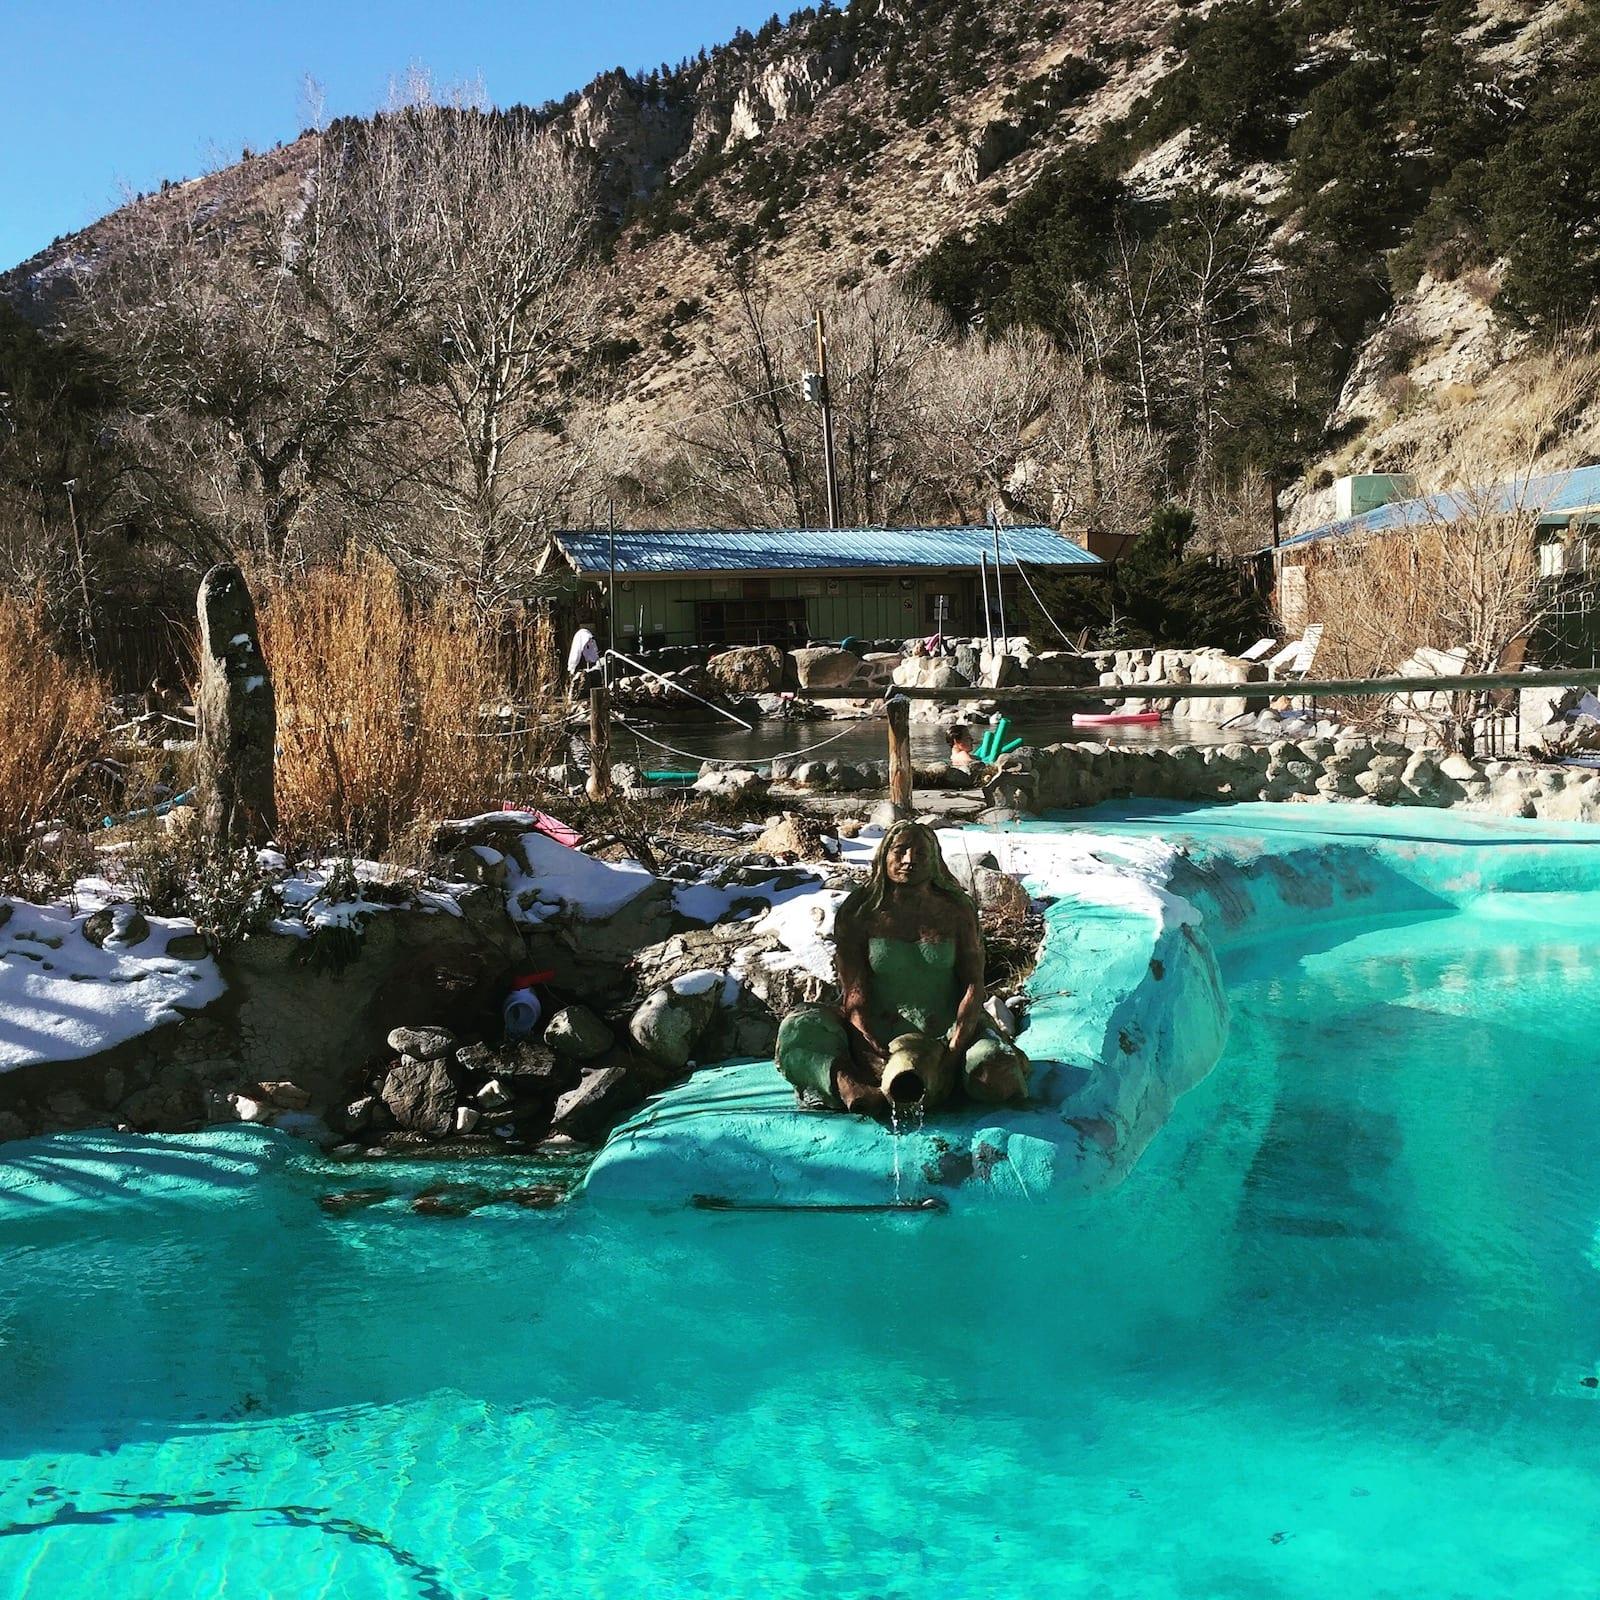 Arizona History Restored at Castle Hot Springs